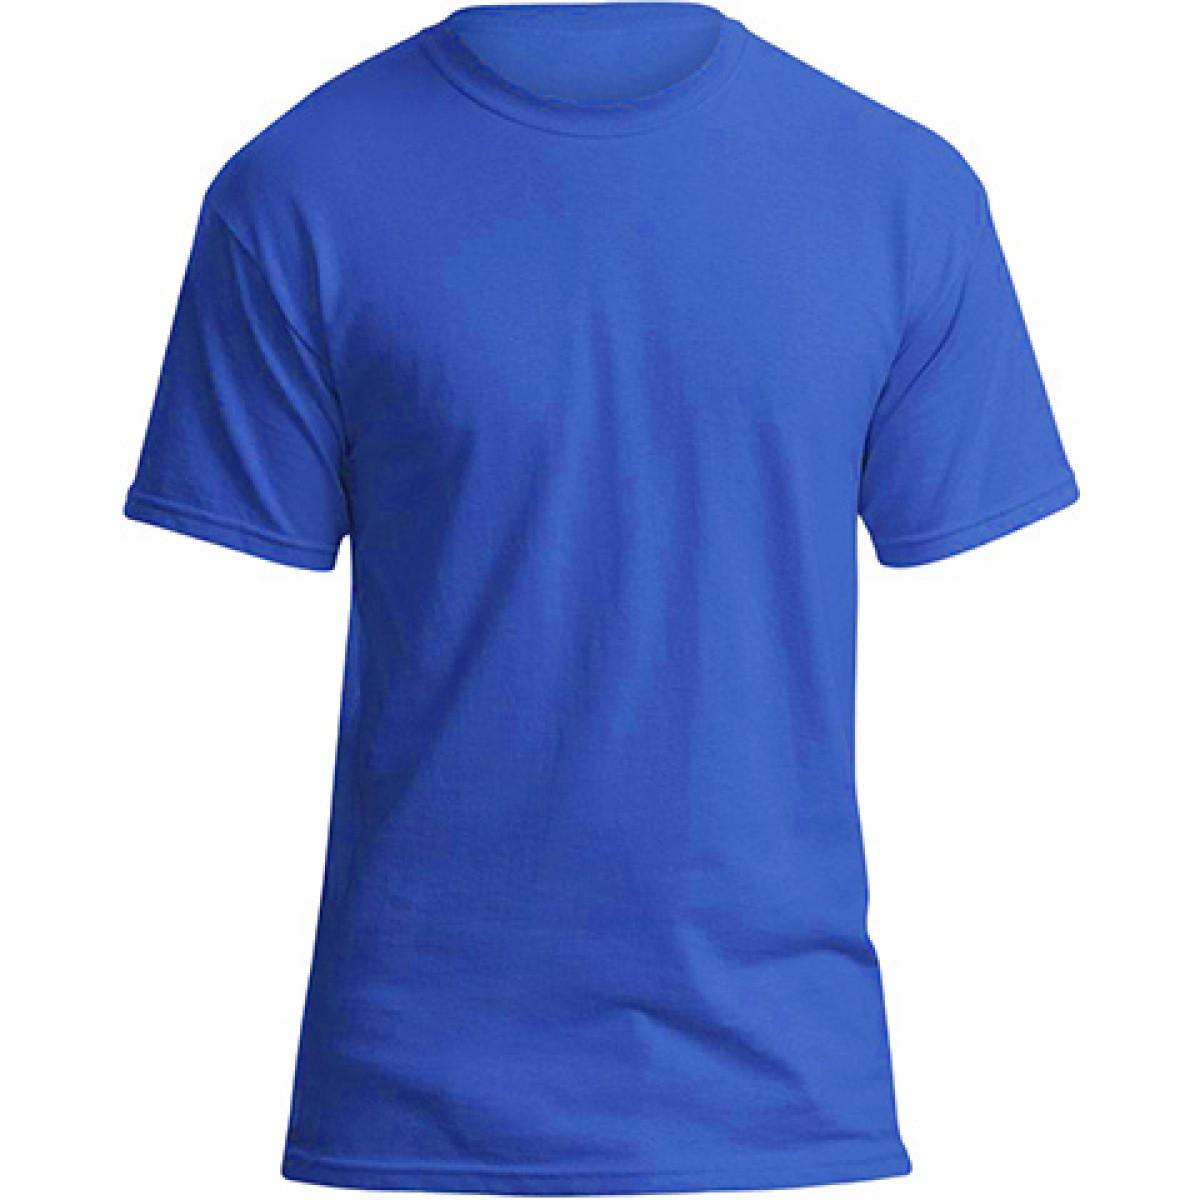 Soft 100% Cotton T-Shirt-Royal Blue-2XL